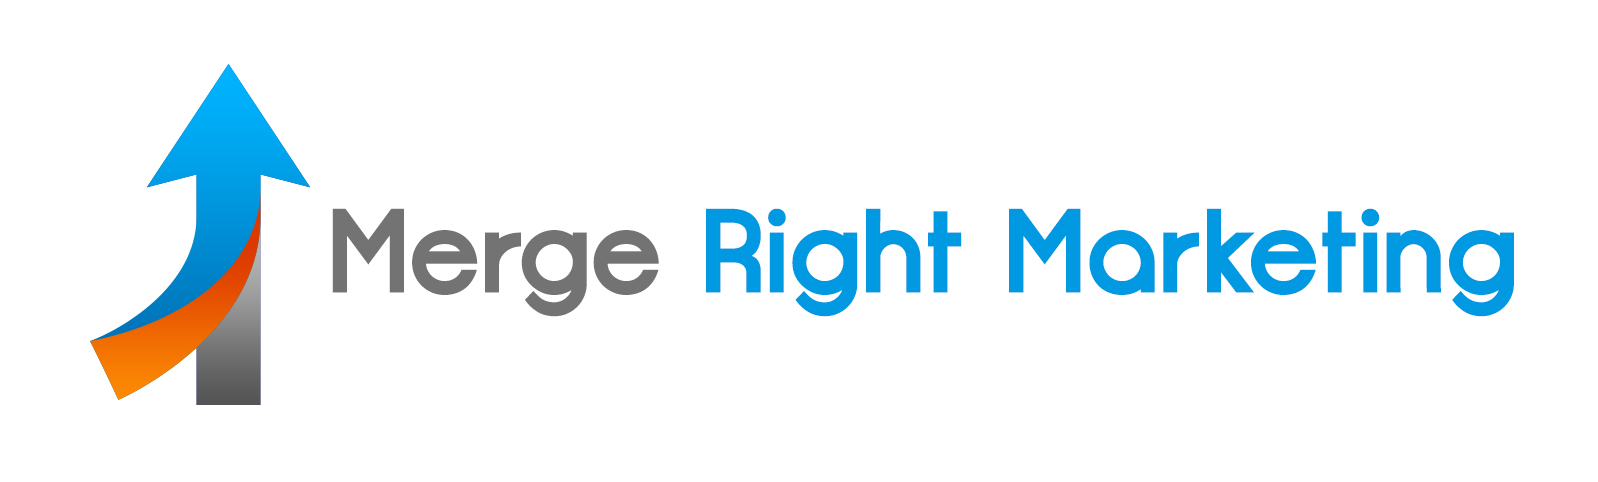 Merge Right Marketing